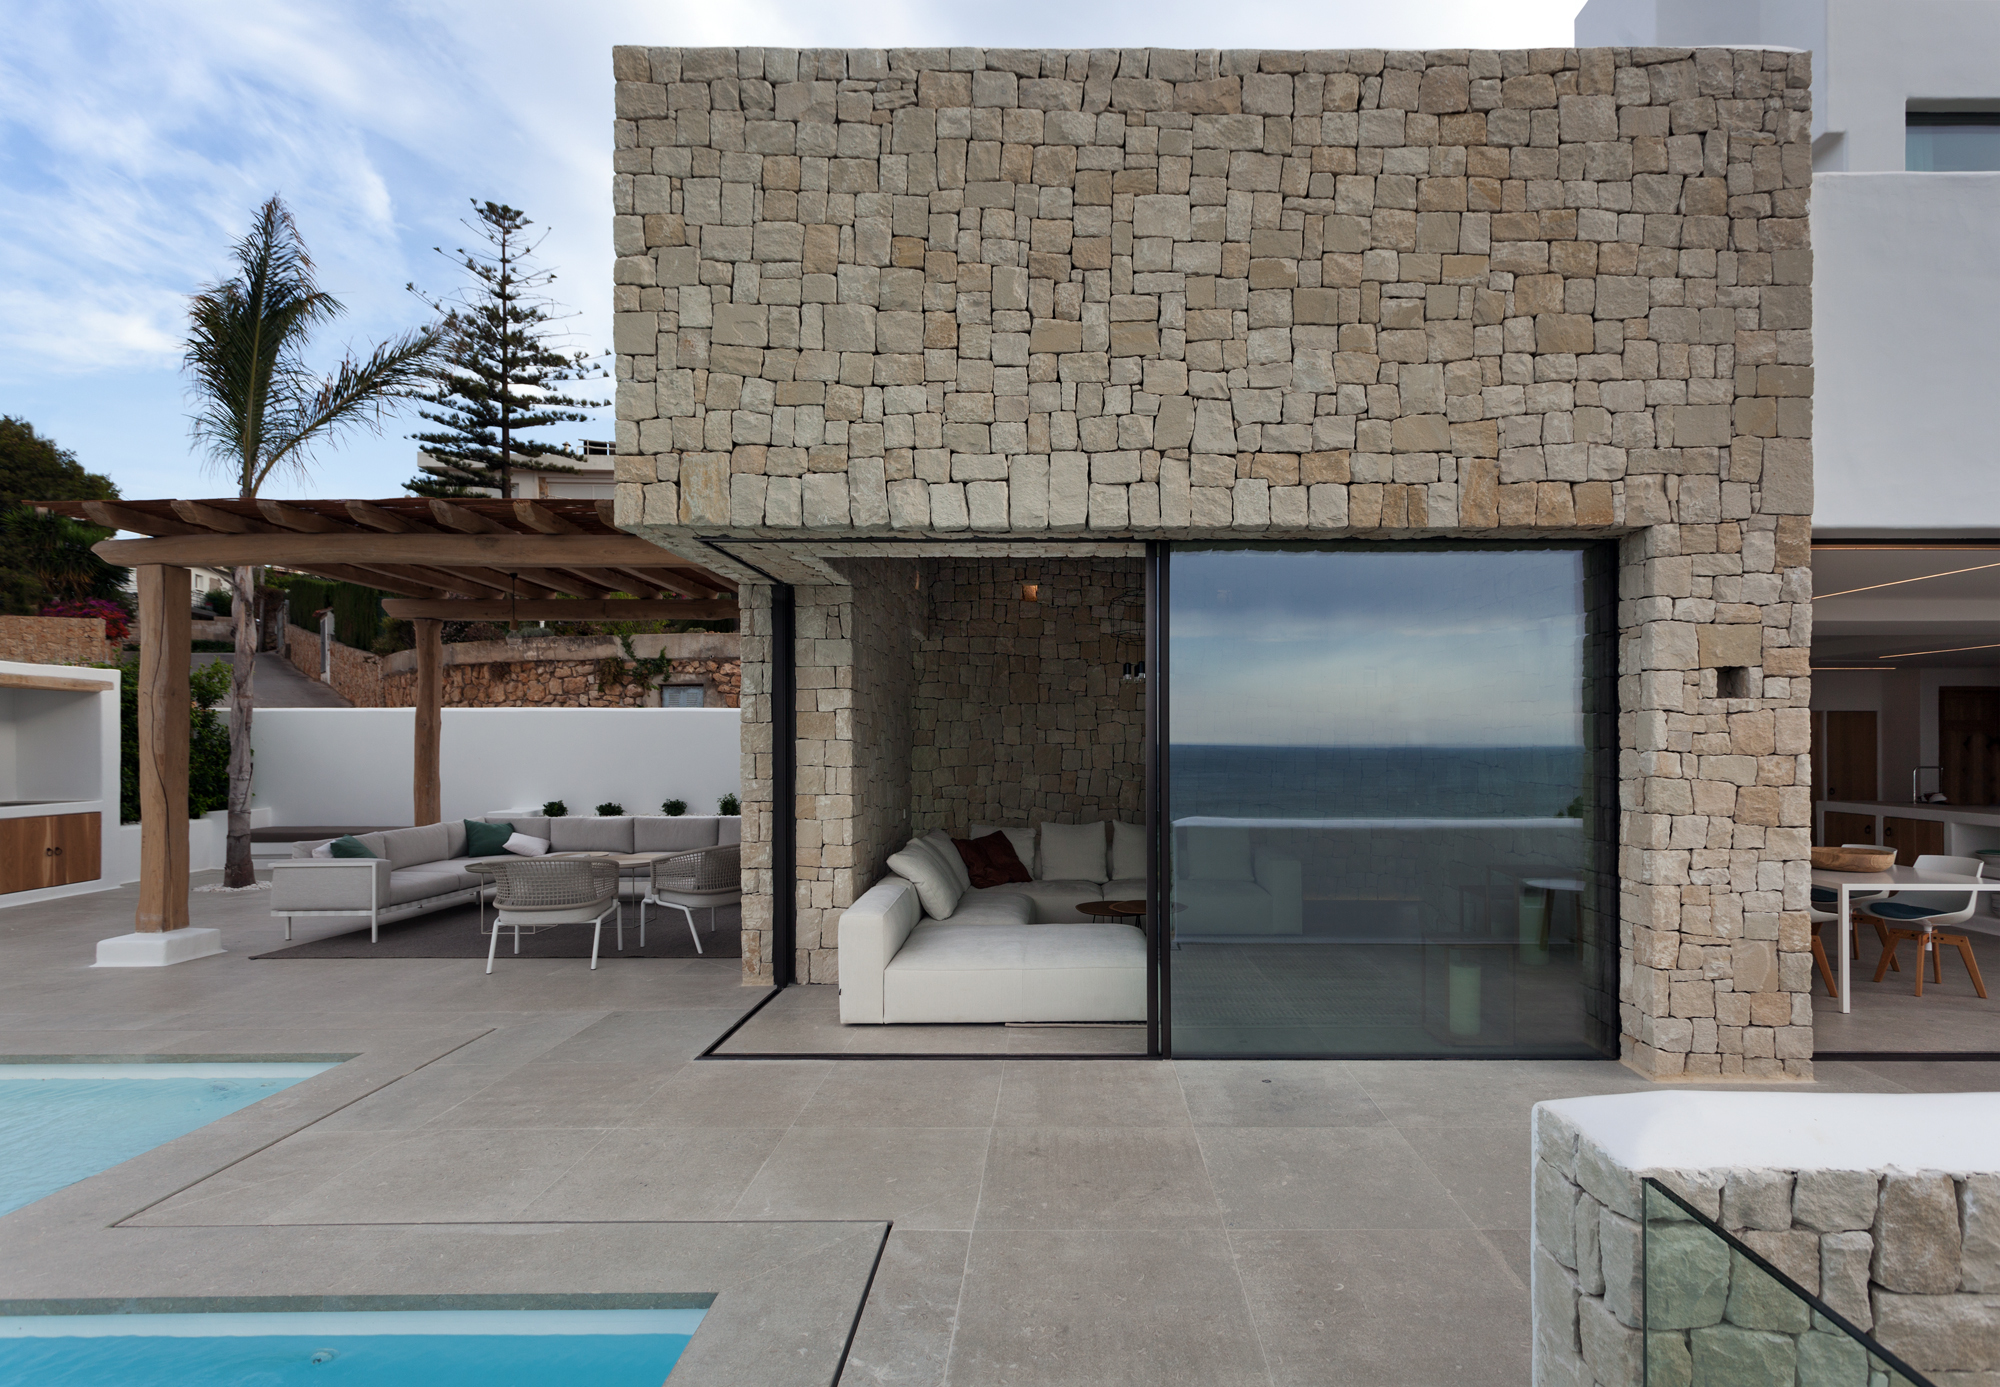 Galeria de casa driessen antonio altarriba arquitecto 2 - Revestimiento para exteriores ...